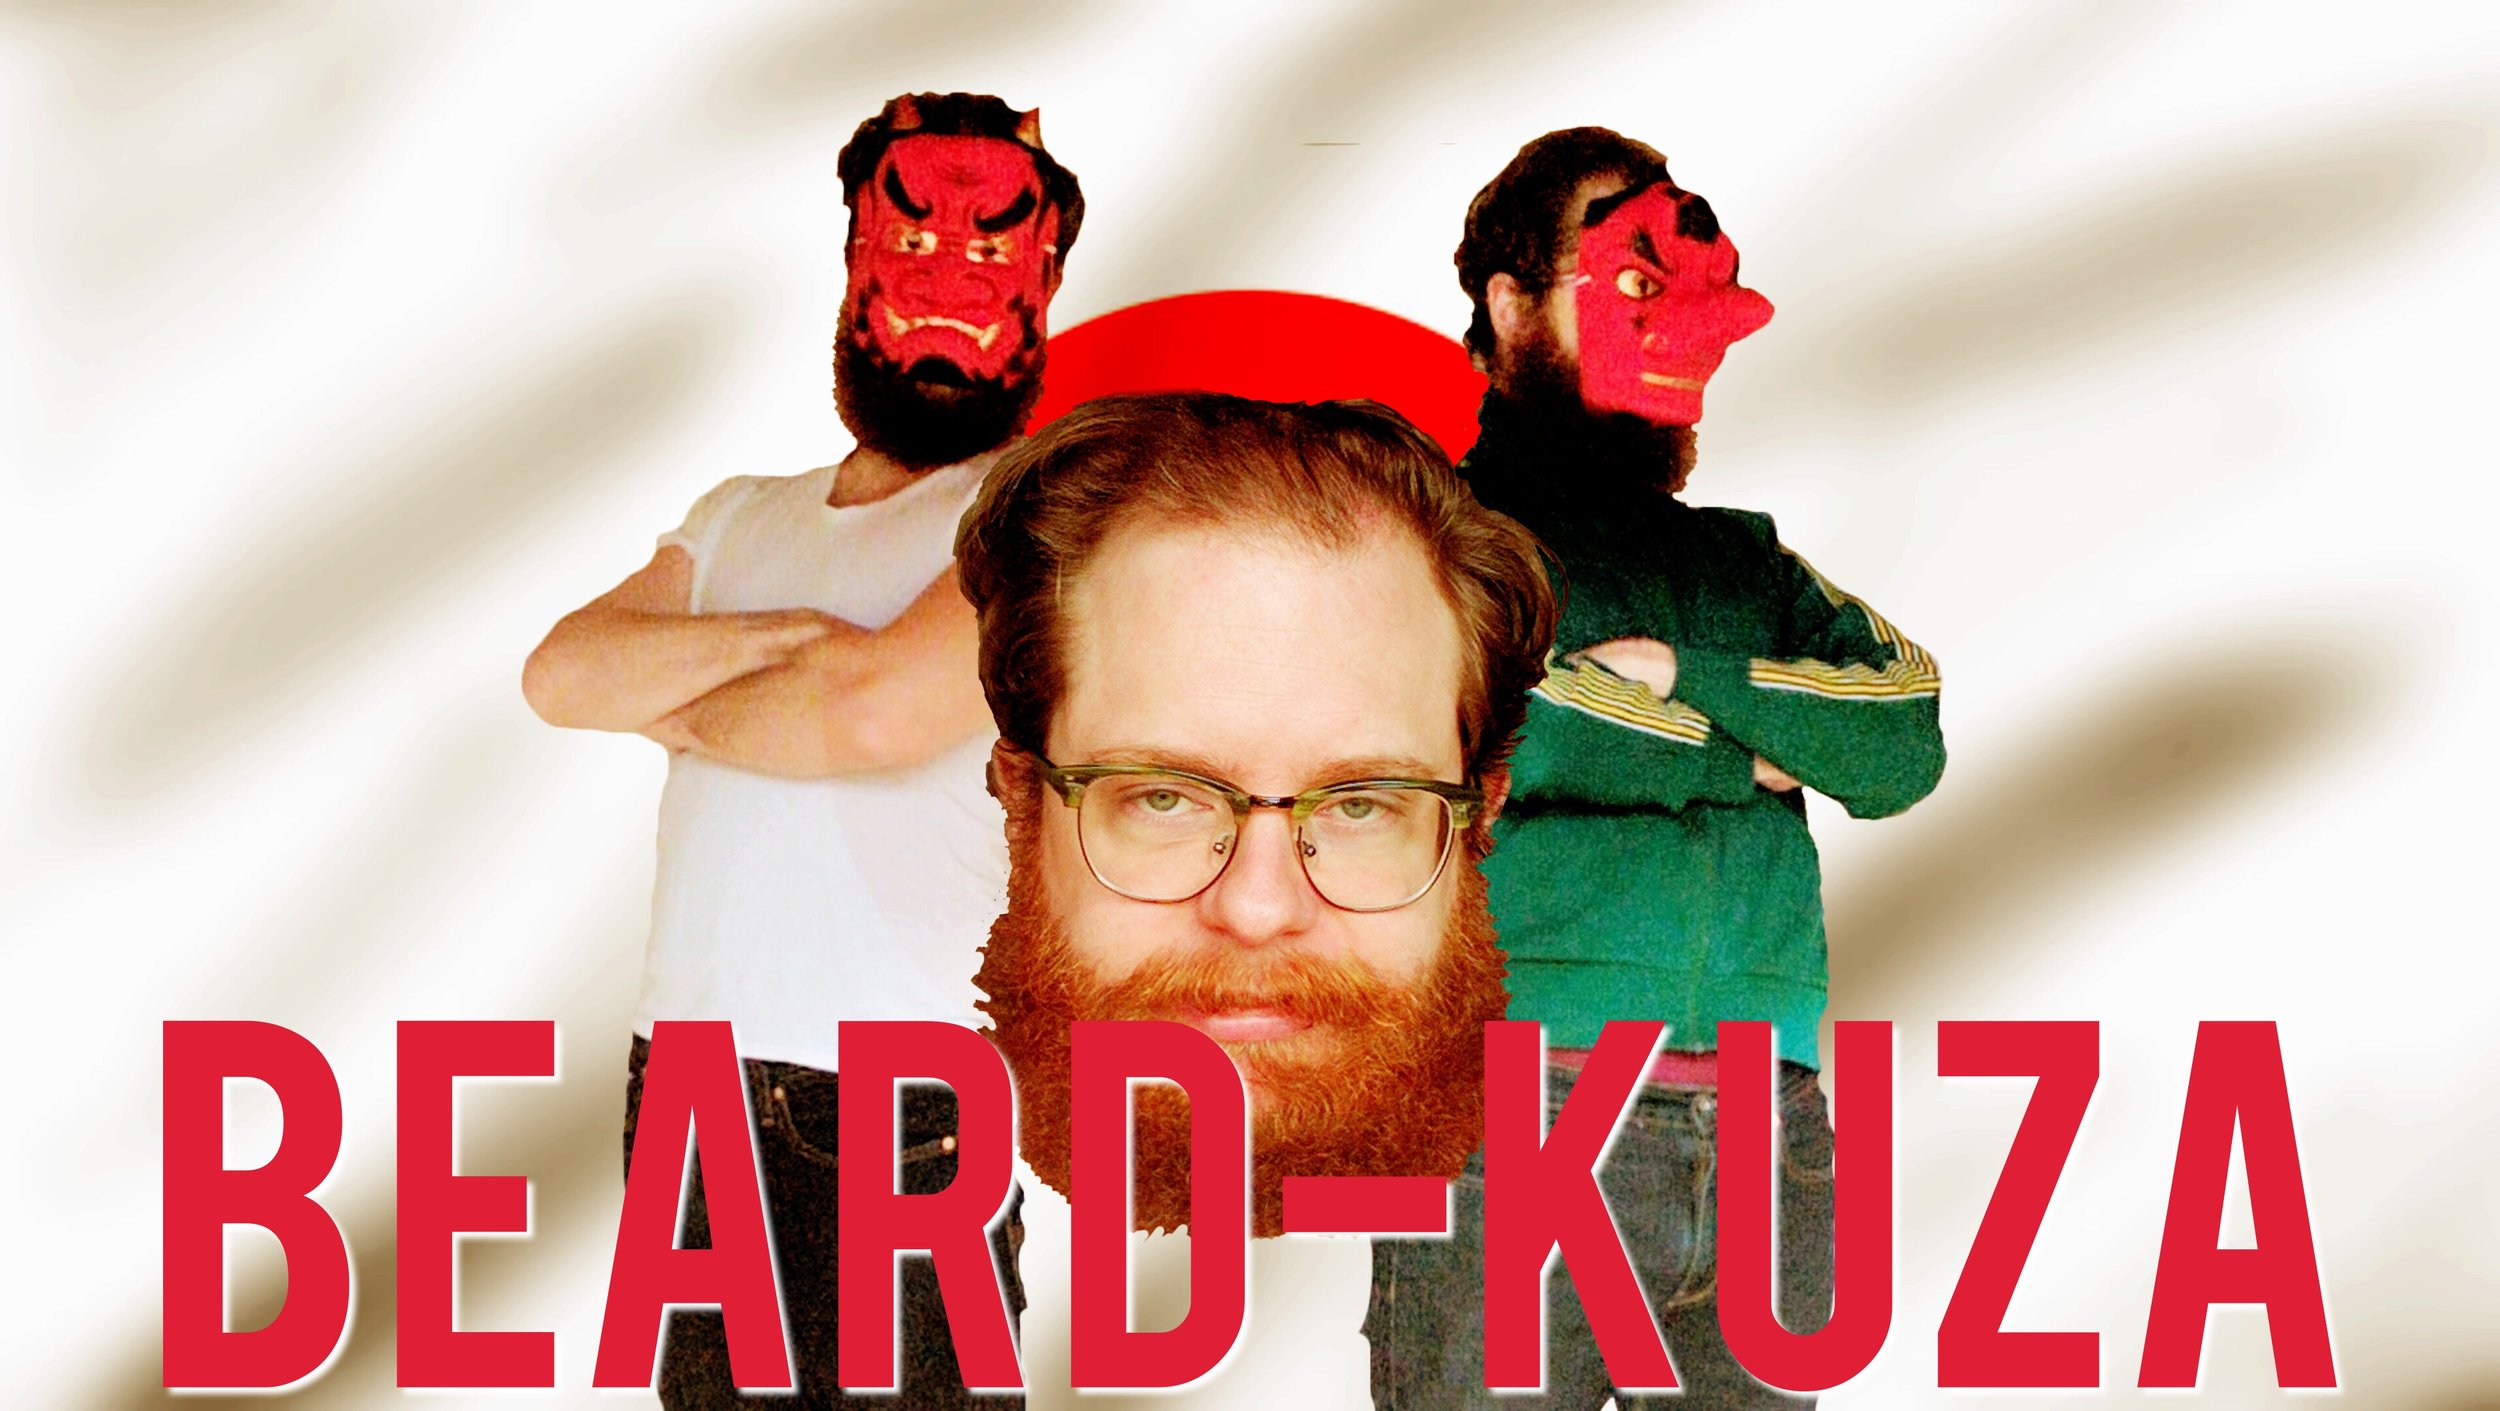 Beard-Kuza.jpg